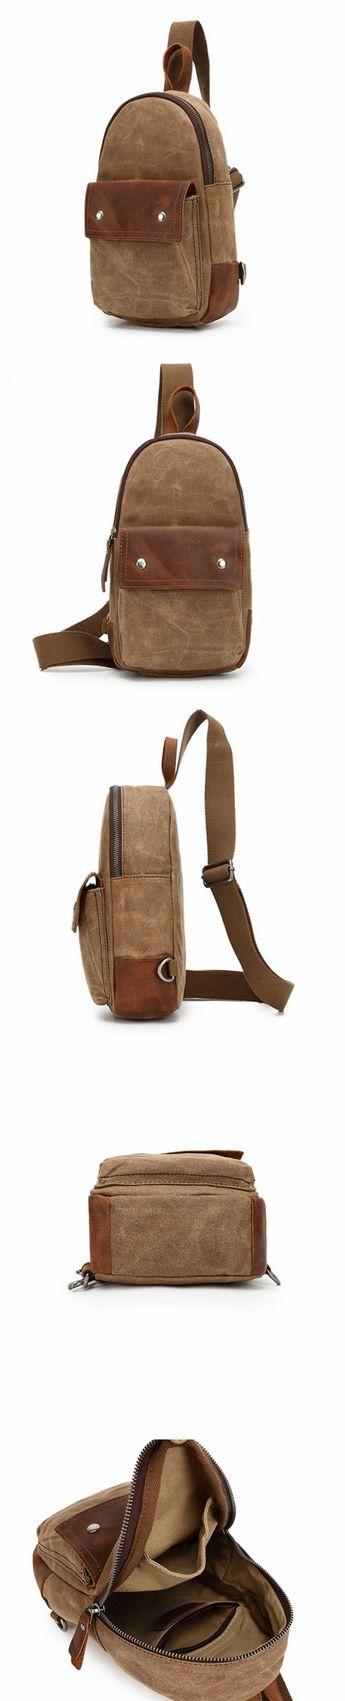 Unisex Canvas Chest Bags Vintage Chest Pack Crossbody Handmade Sling  Messenger Bags 2070 6efbfeb5263f7